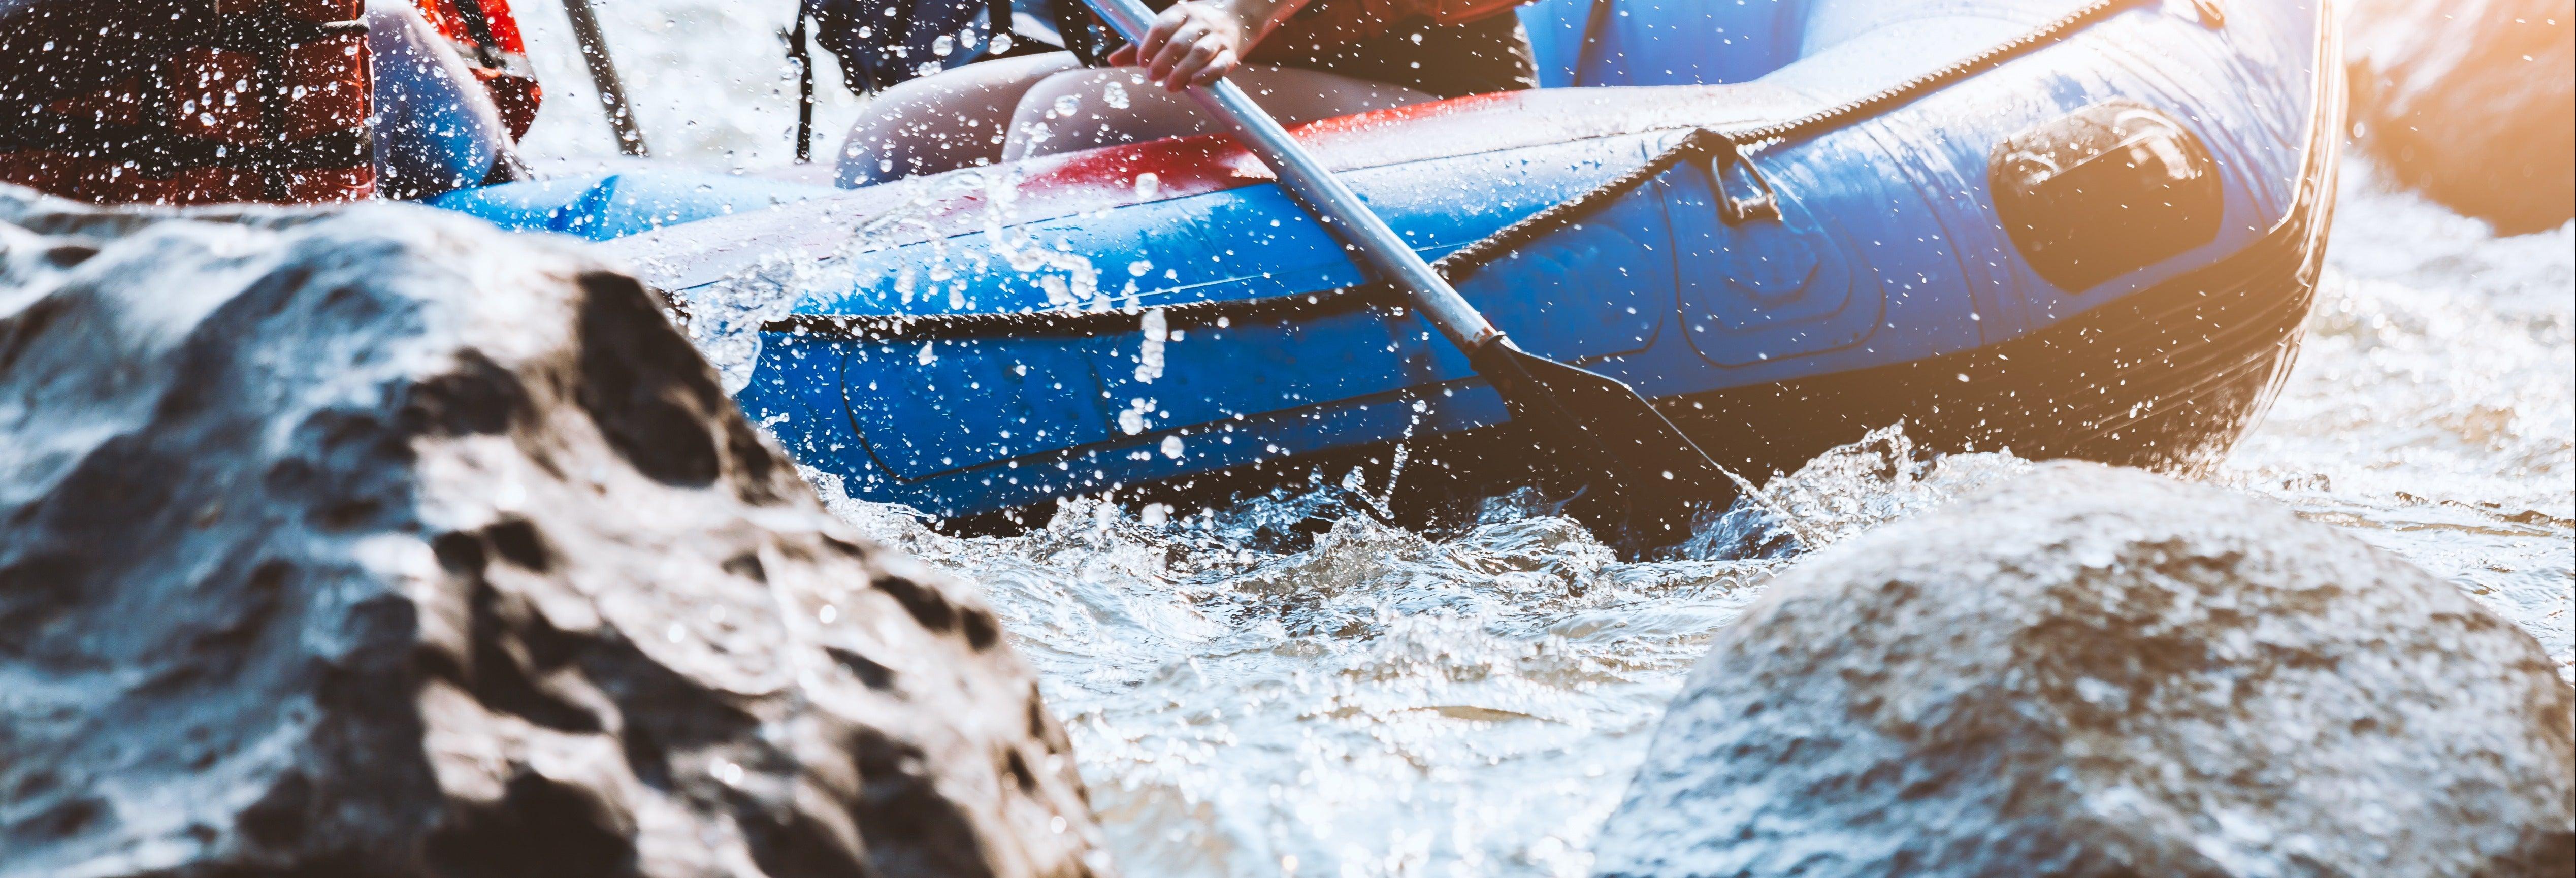 Rafting sur le Rio Chili